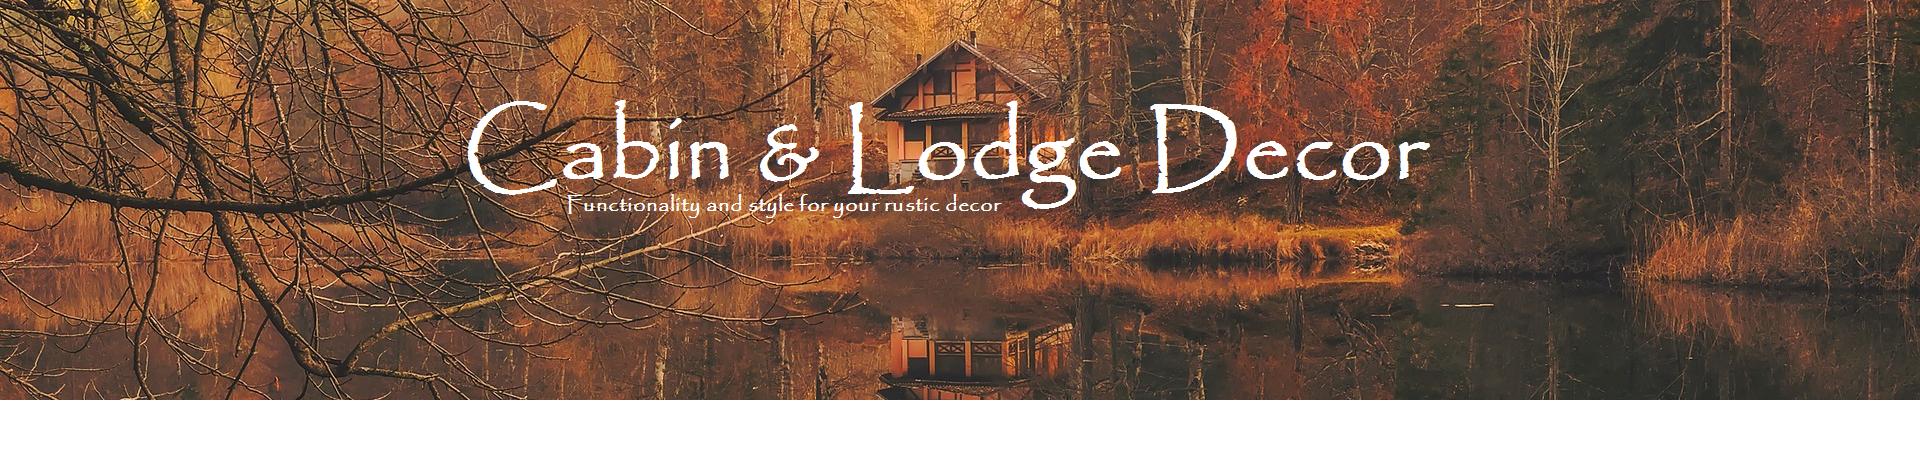 Cabin Lodge Decor